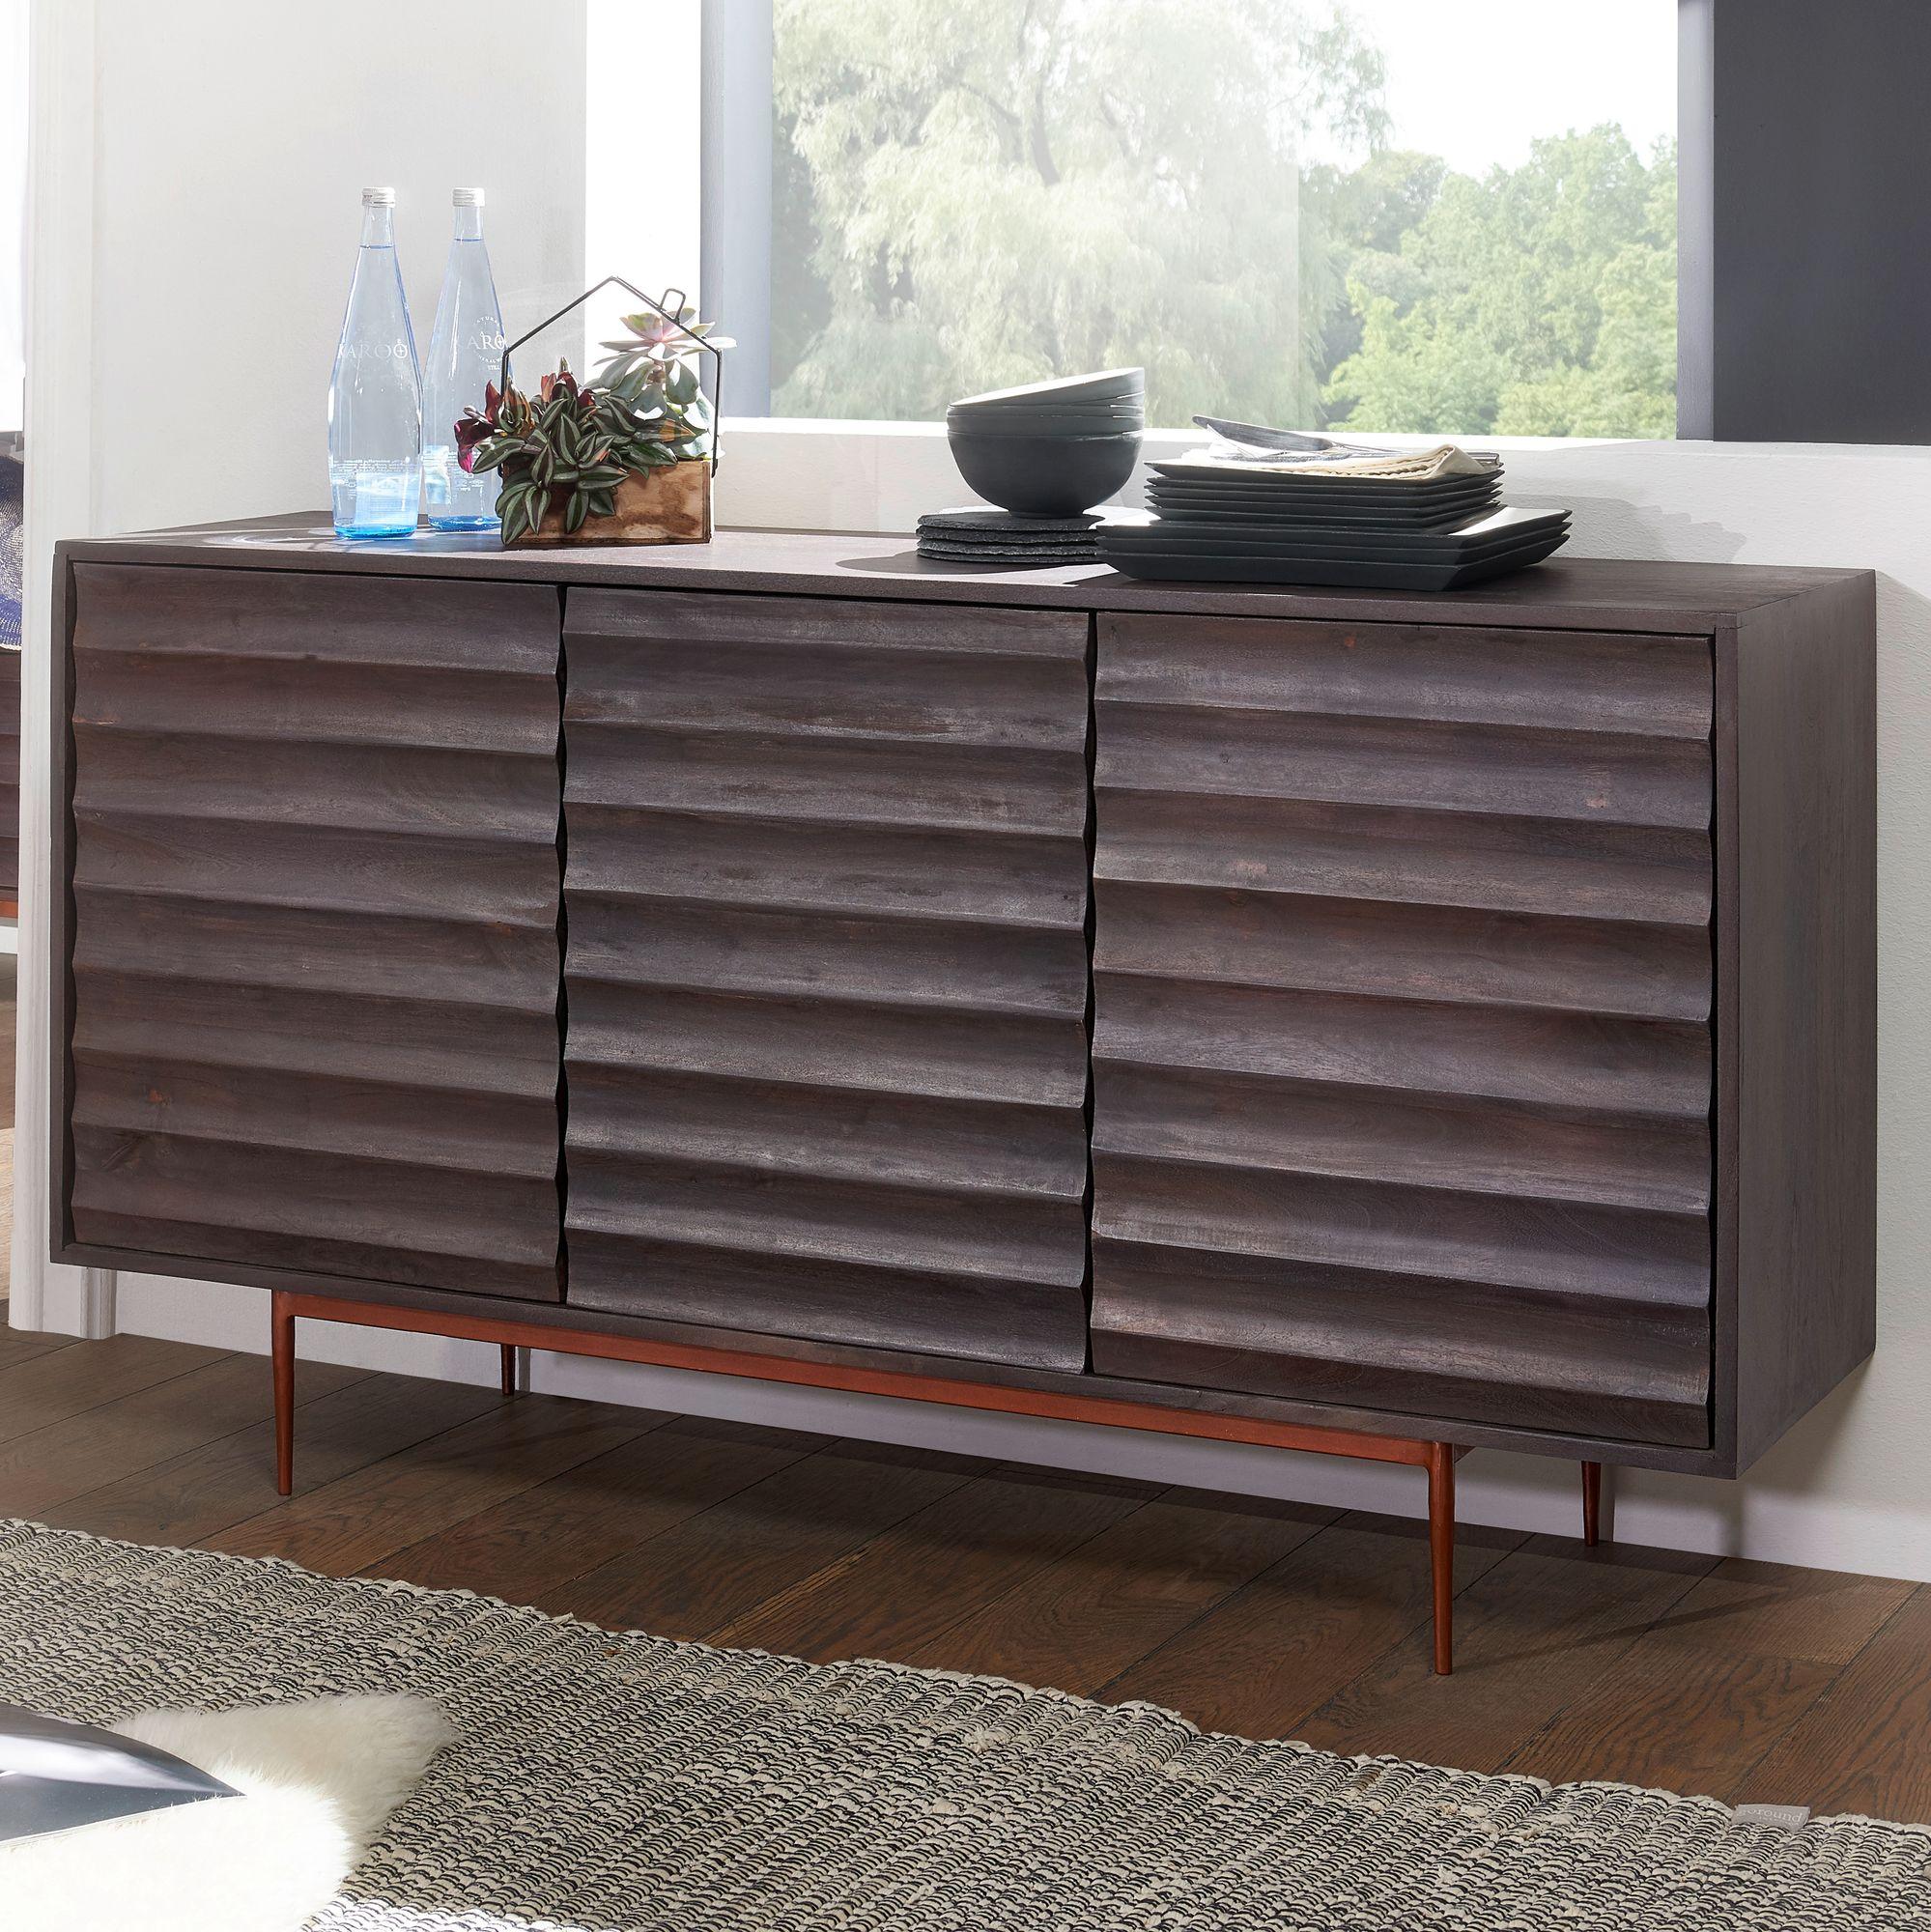 Finebuy Sideboard 148 Cm Anrichte Akazie Kommode Schrank Massiv Holz